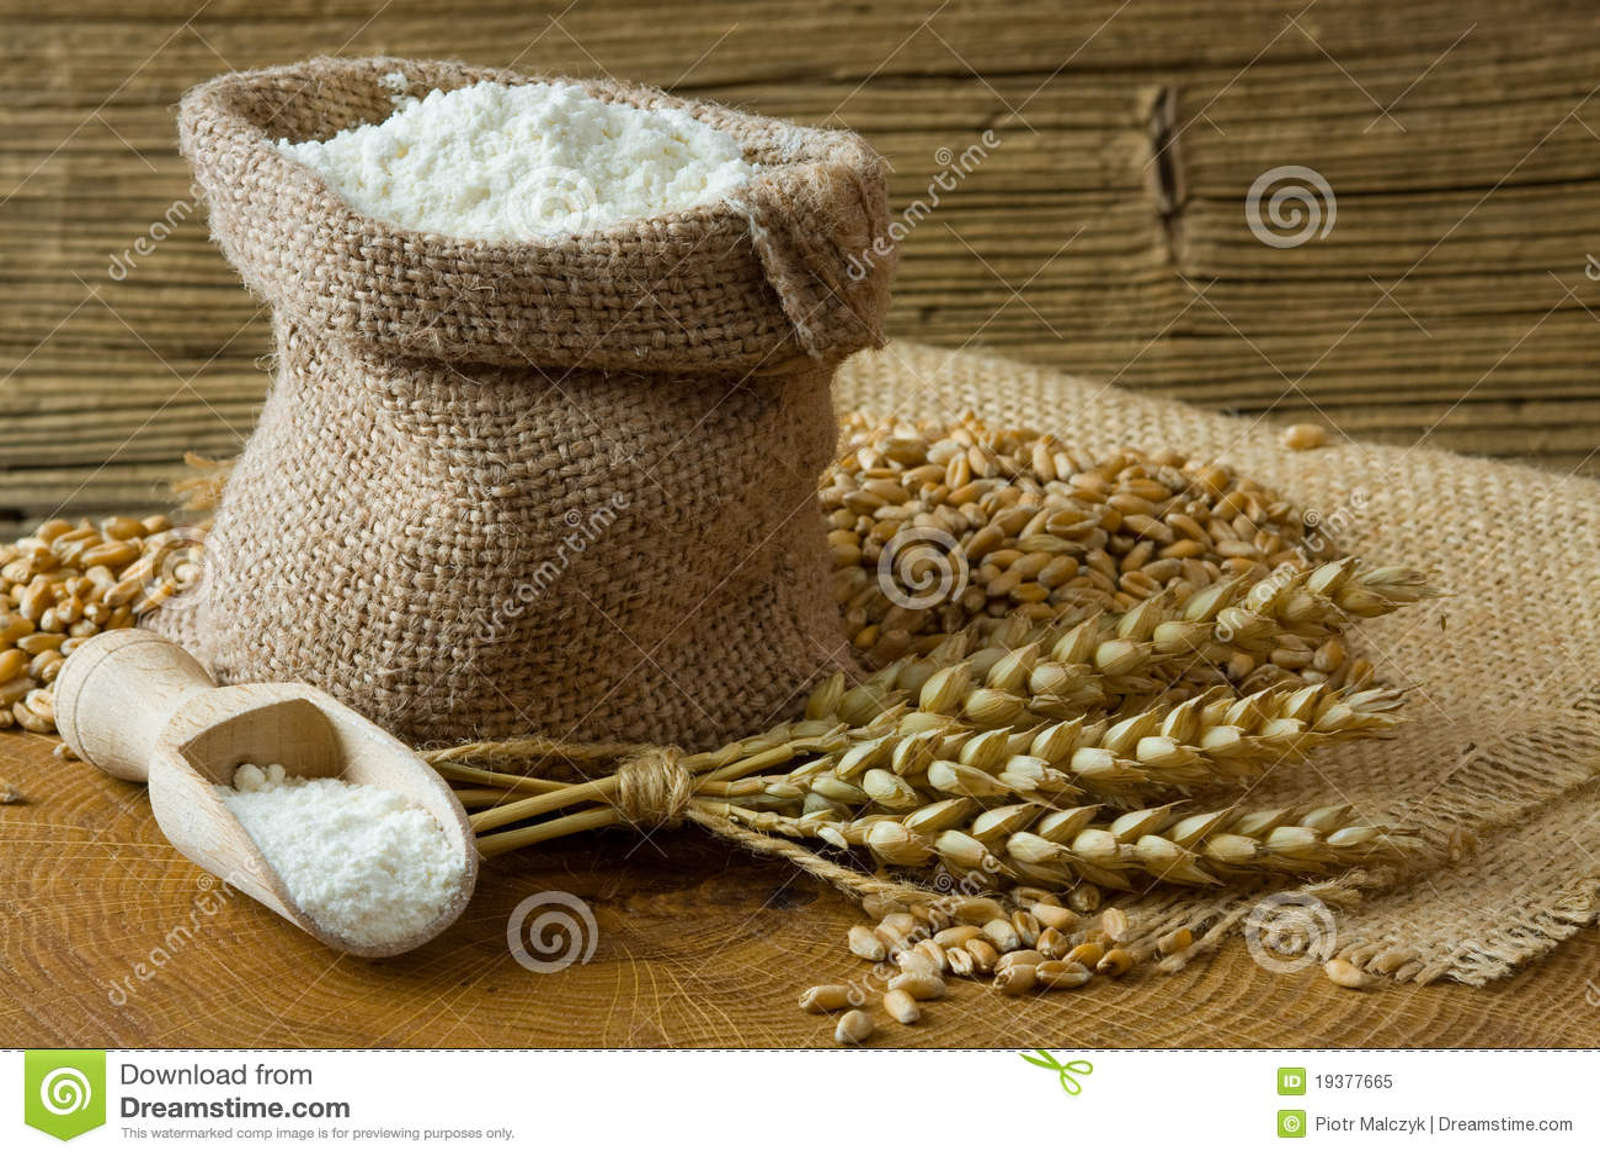 Wheat grain and flour